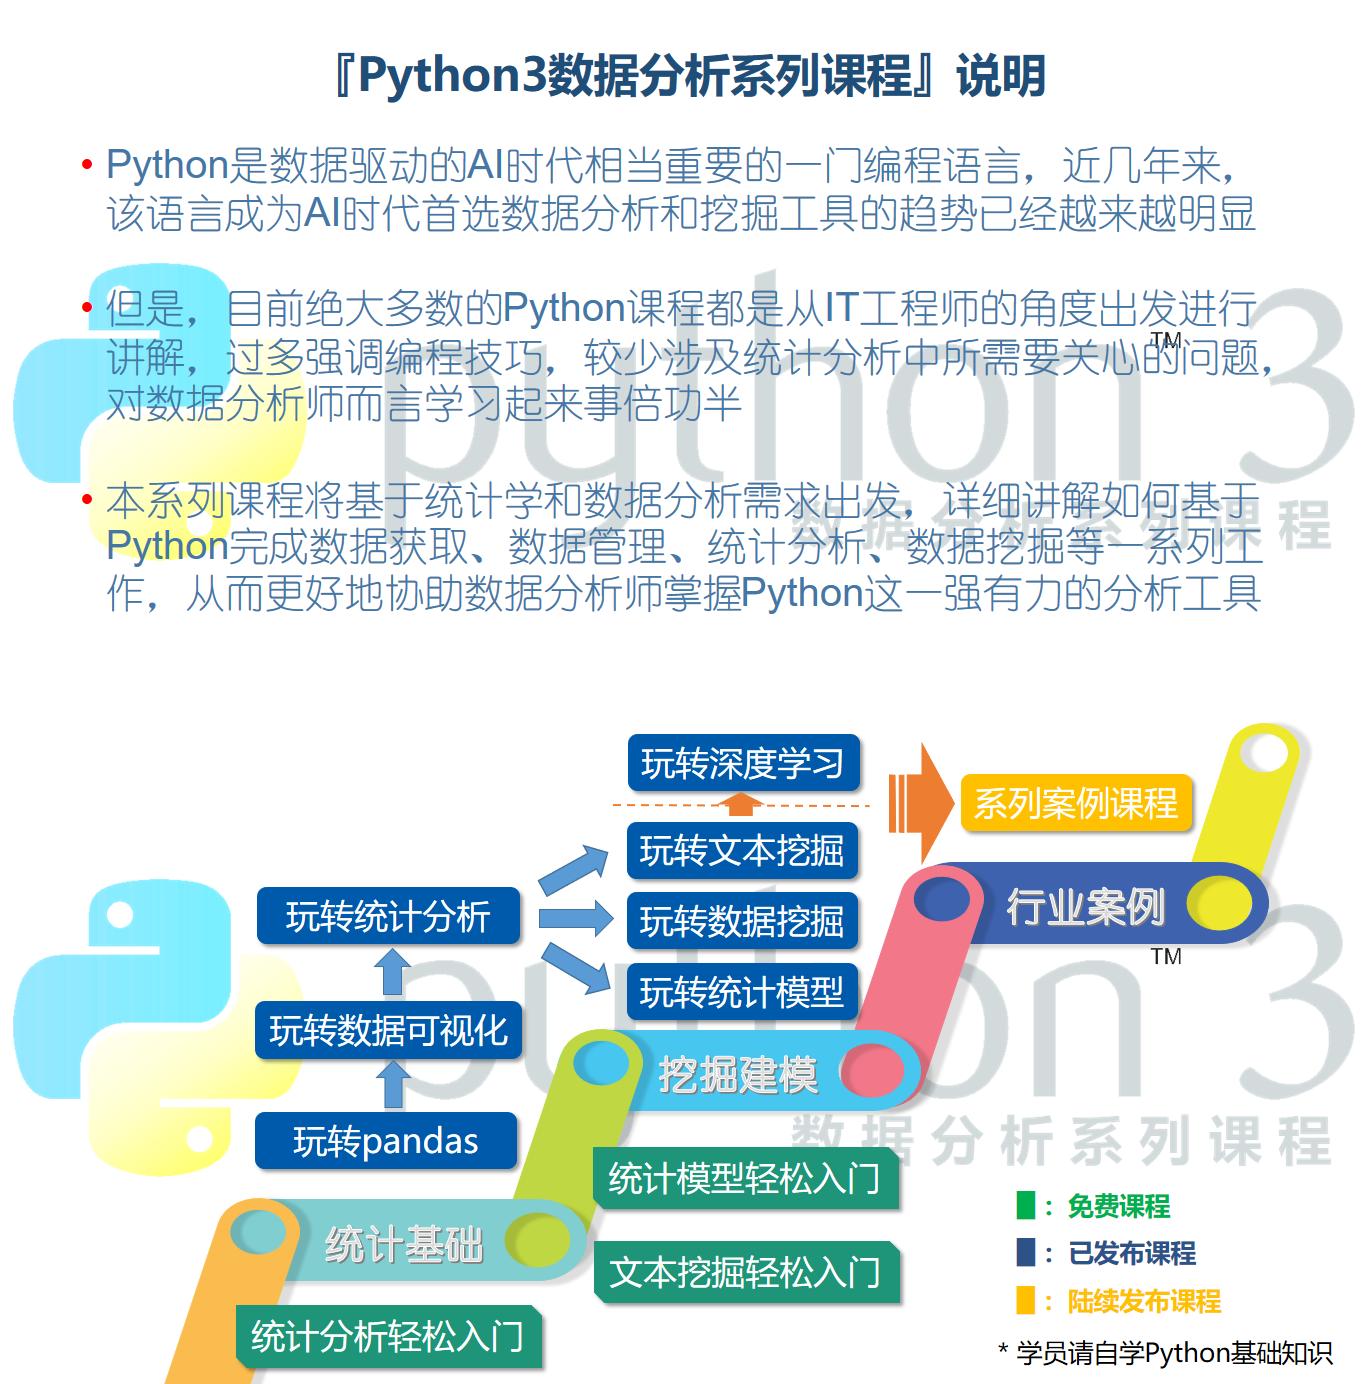 python推广.png